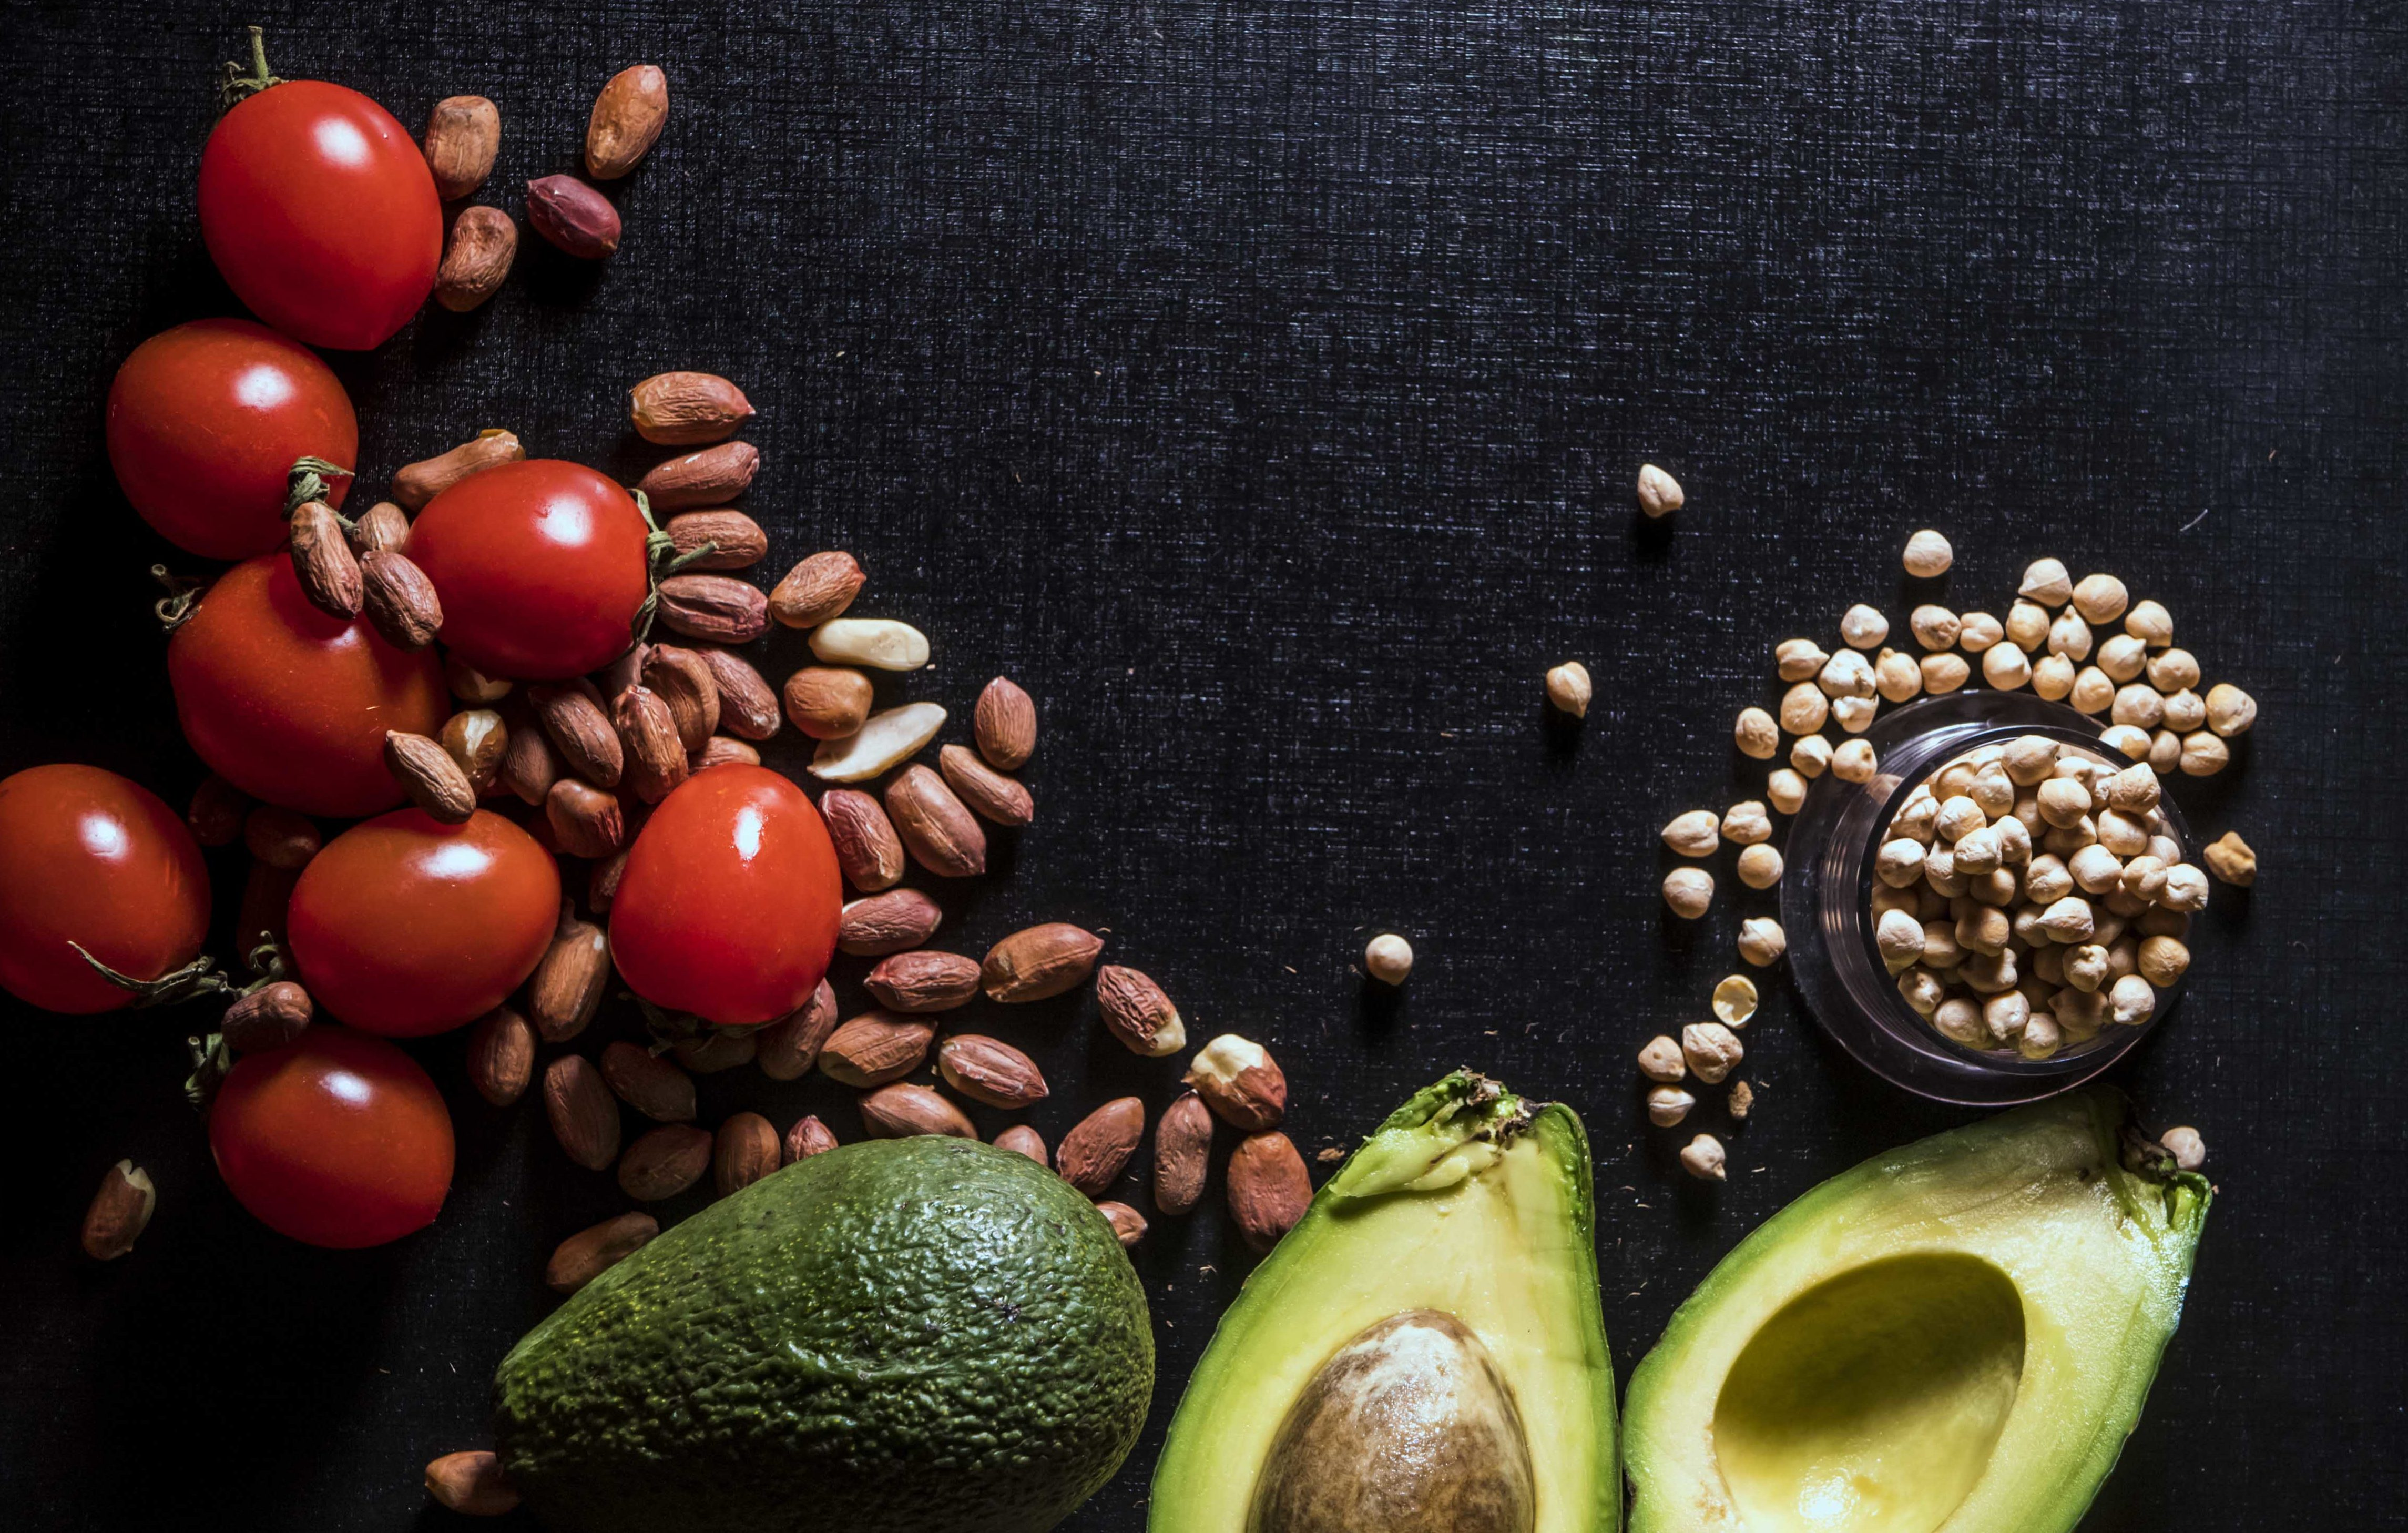 recensioni di dieta casa natur